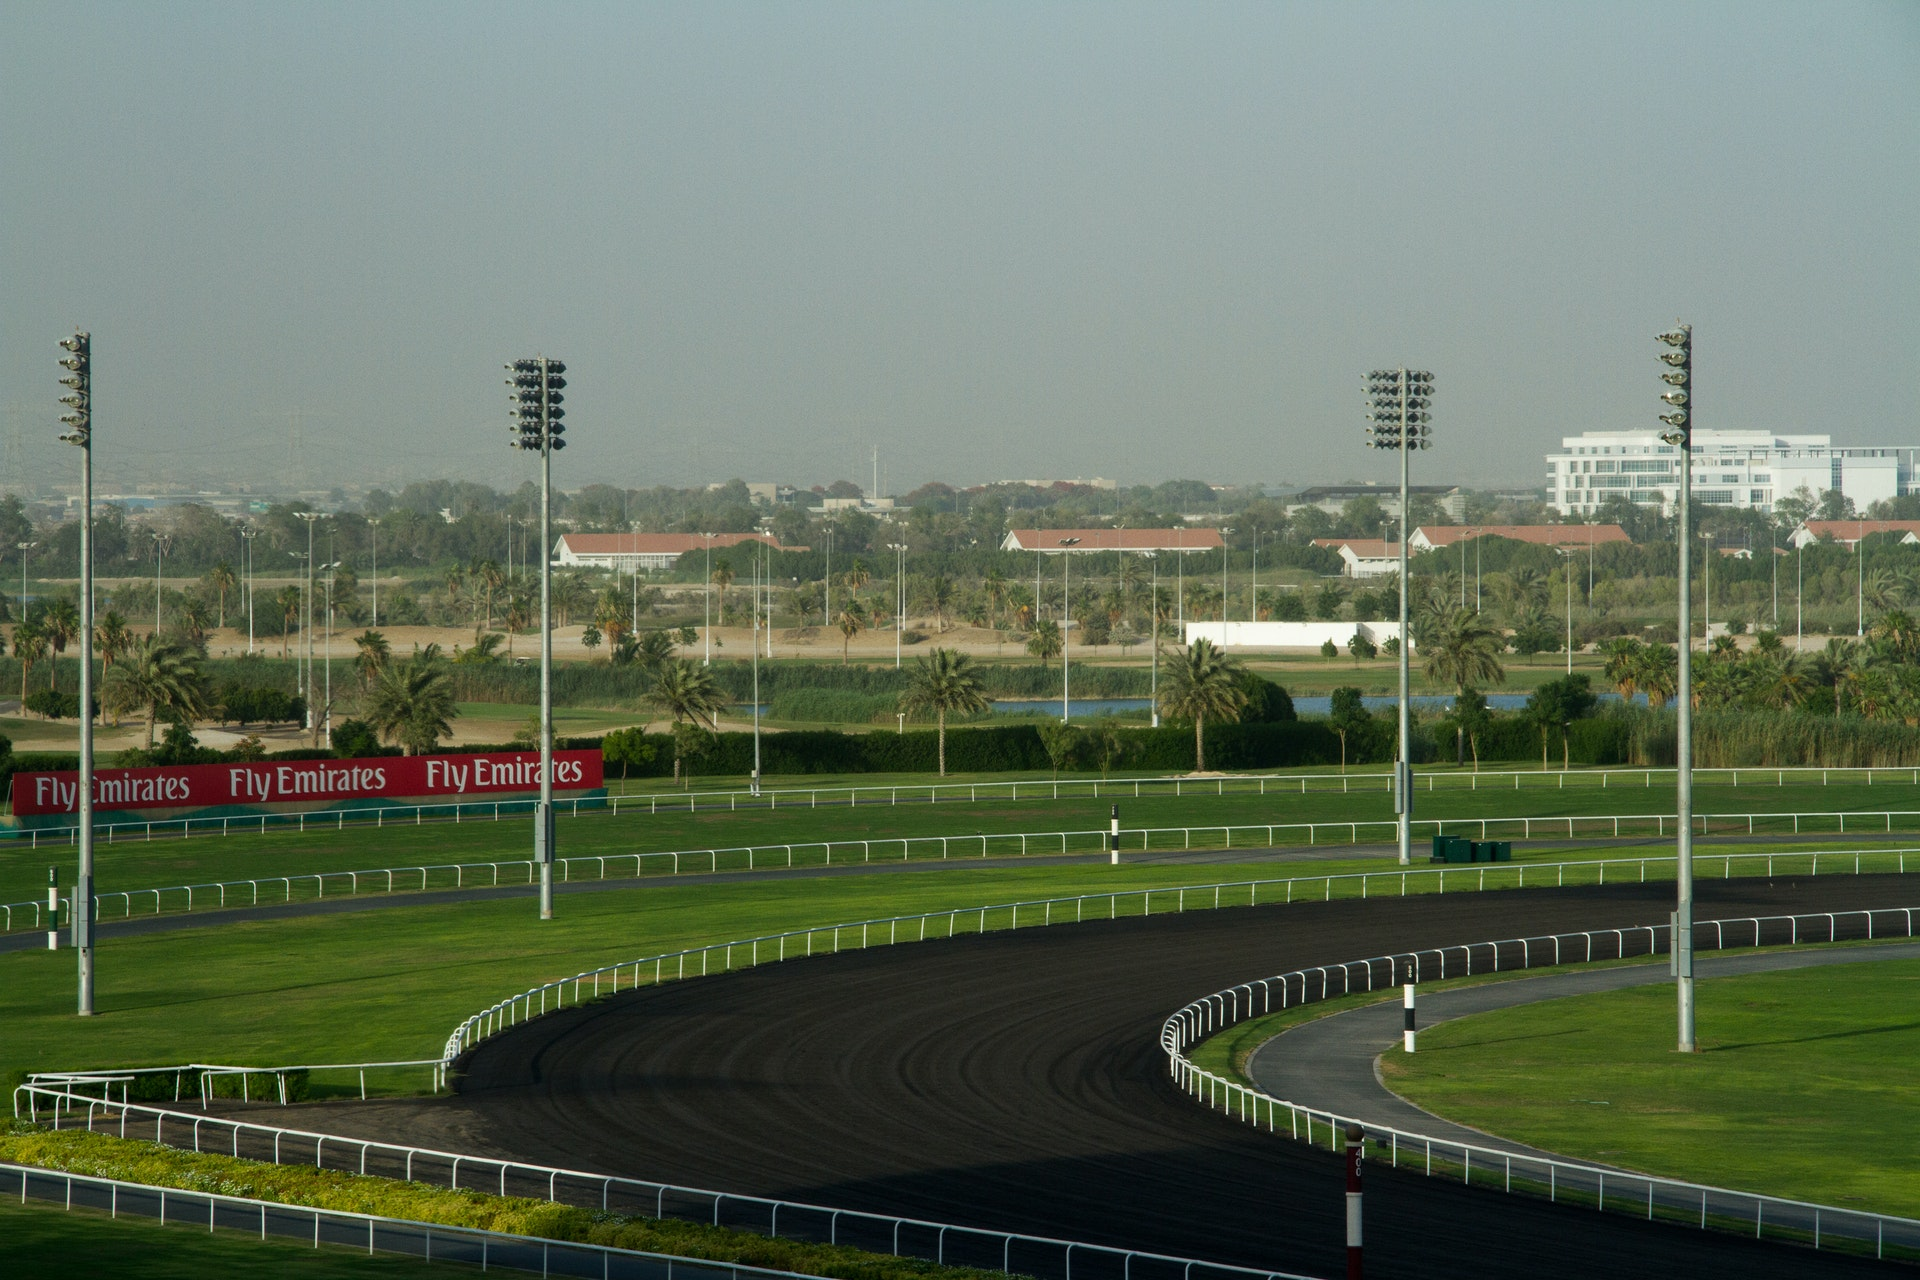 Meydan Racecourse, venue for the Dubai World Cup